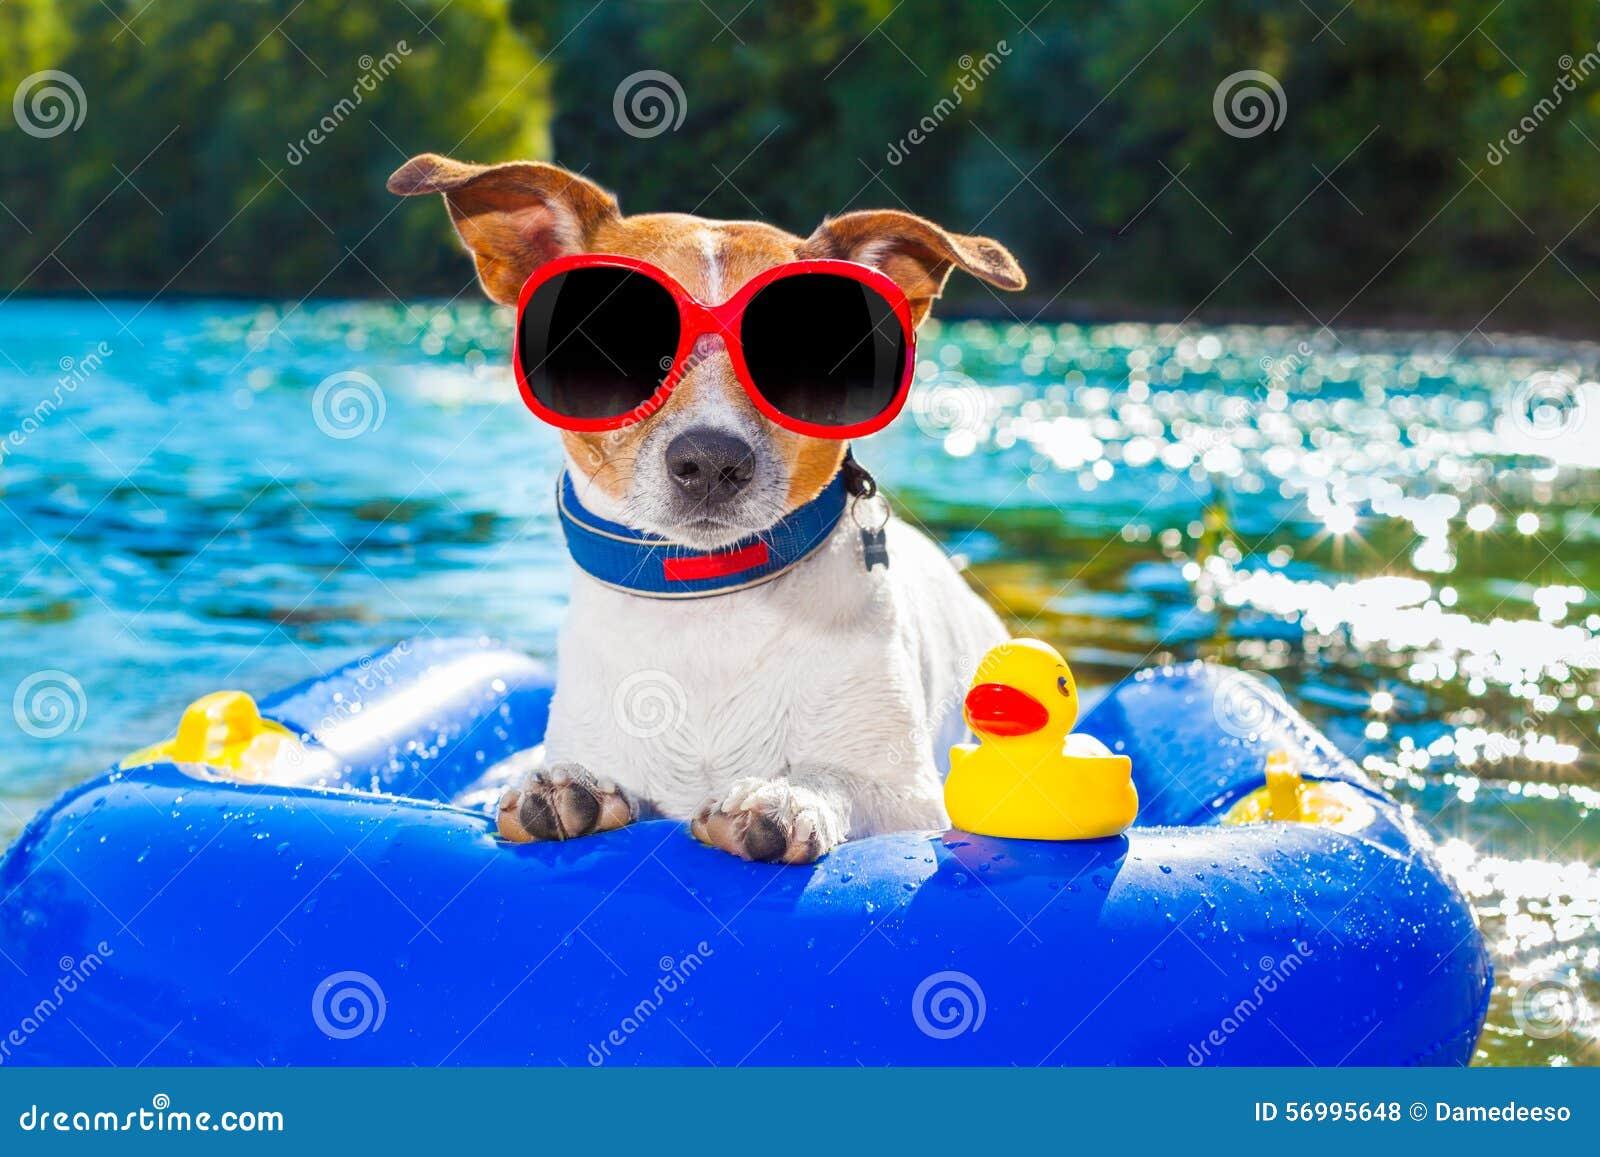 Jack Rubber Dog Toy